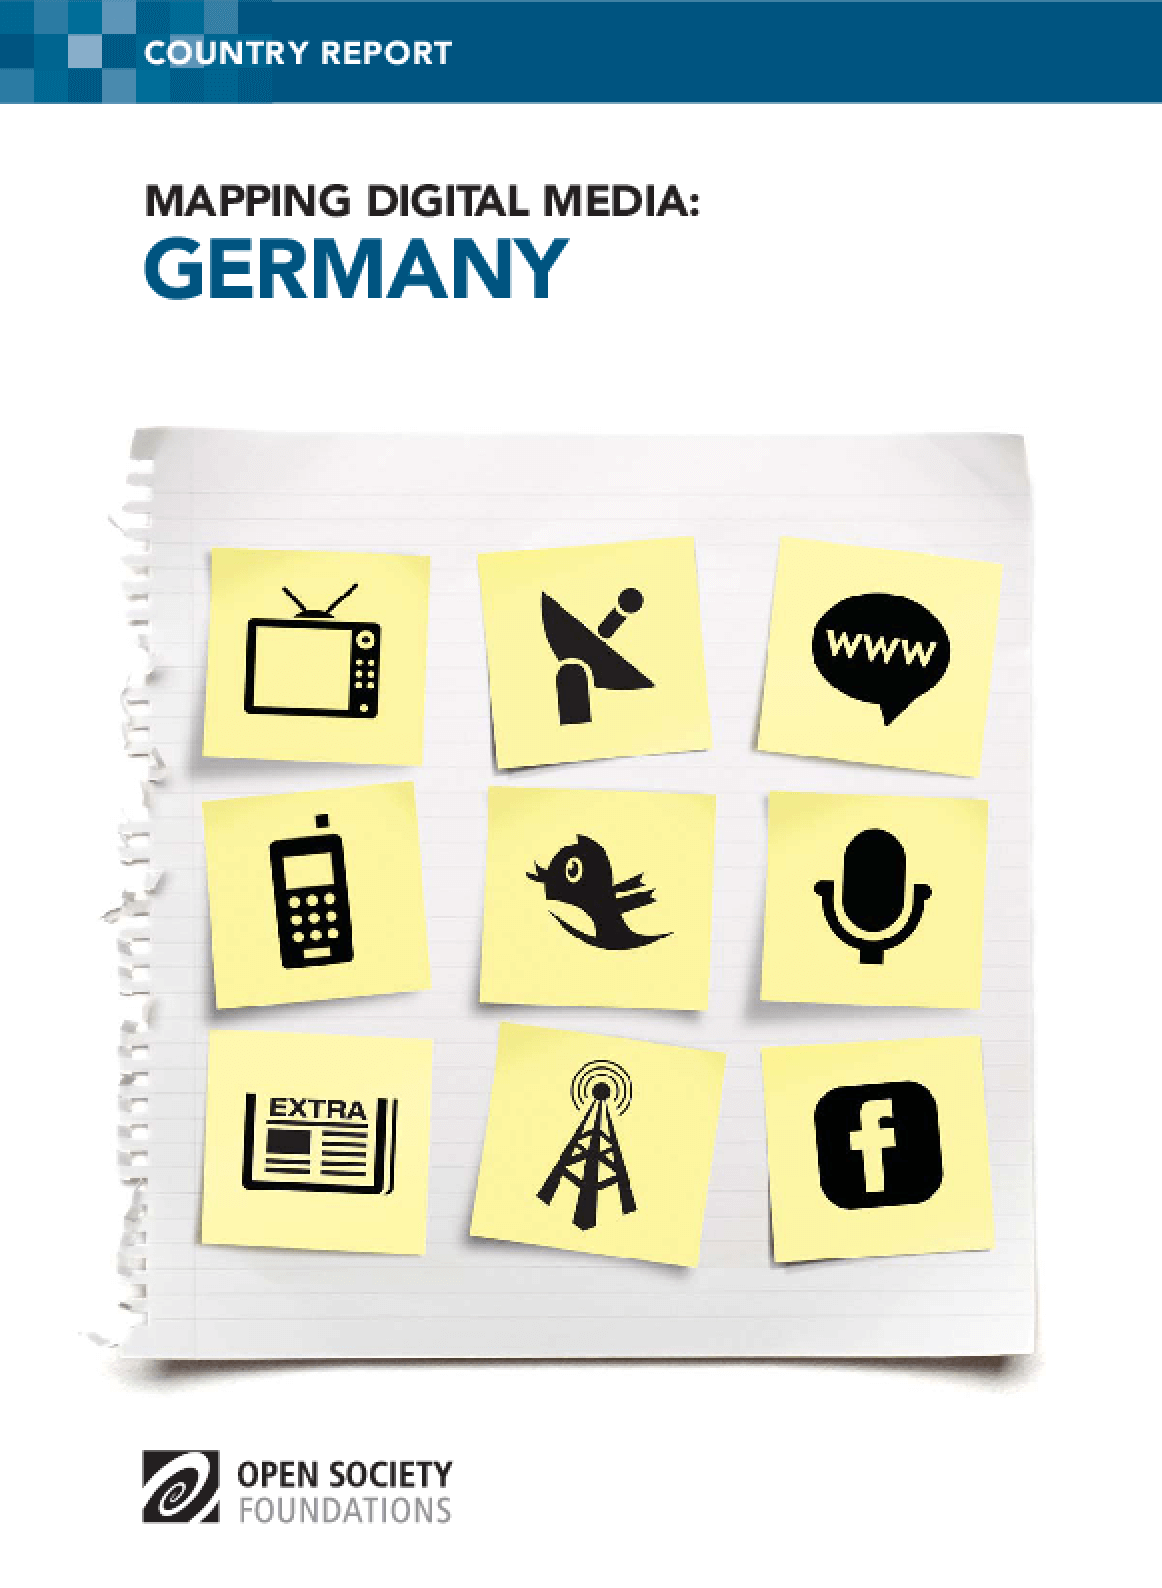 Mapping Digital Media: Germany